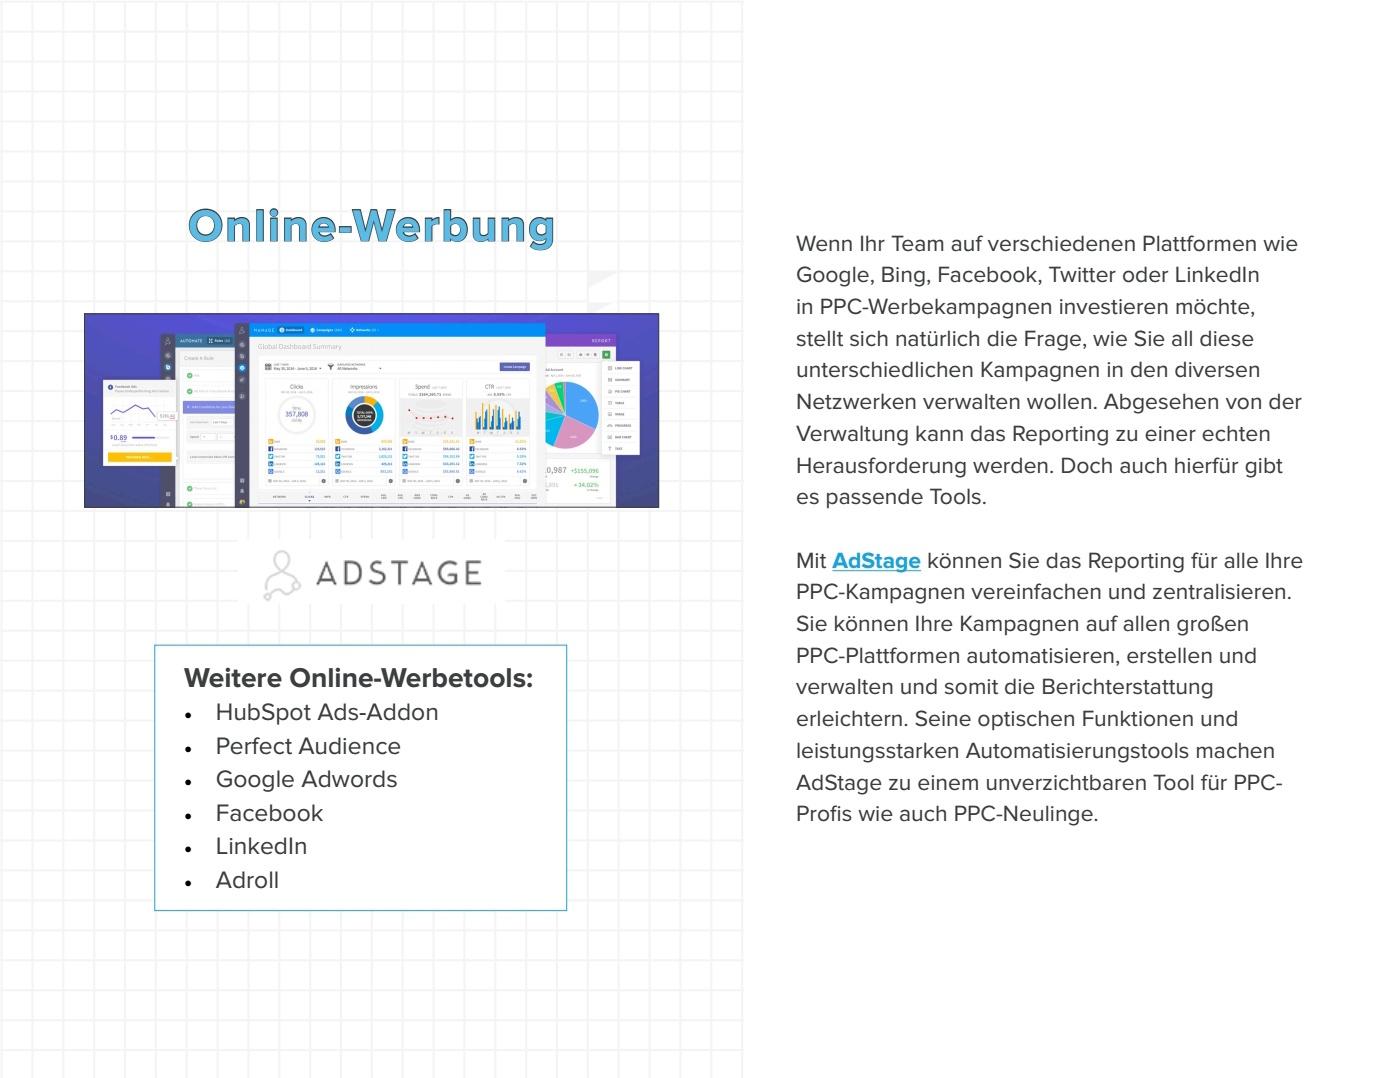 Beste Startup Vorschlag Vorlage Galerie - Entry Level Resume ...